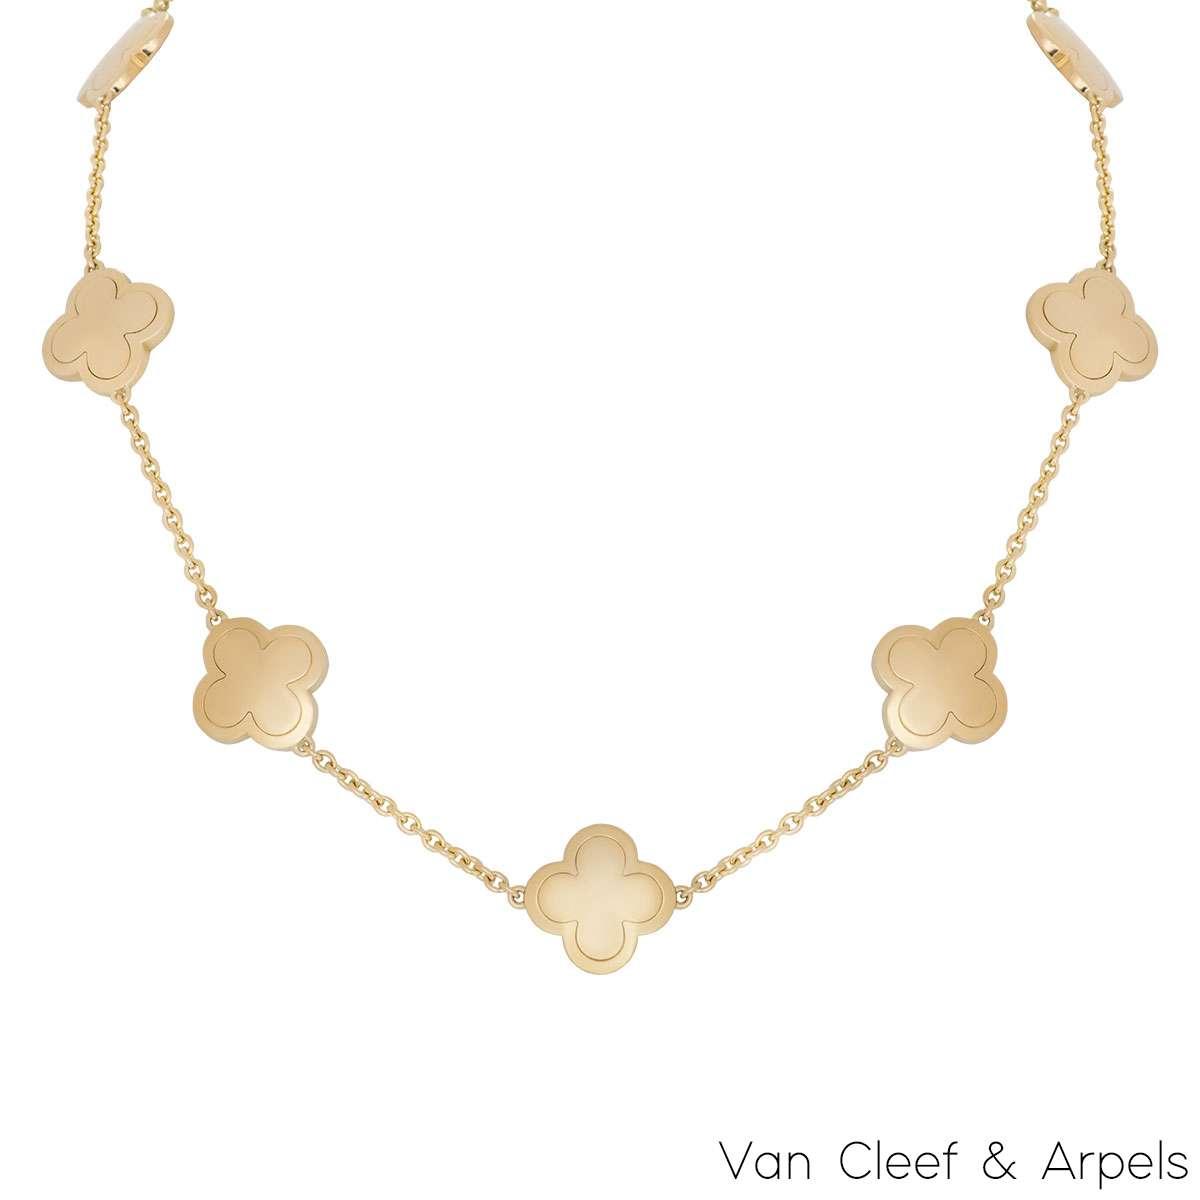 Van Cleef & Arpels Yellow Gold Alhambra Necklace